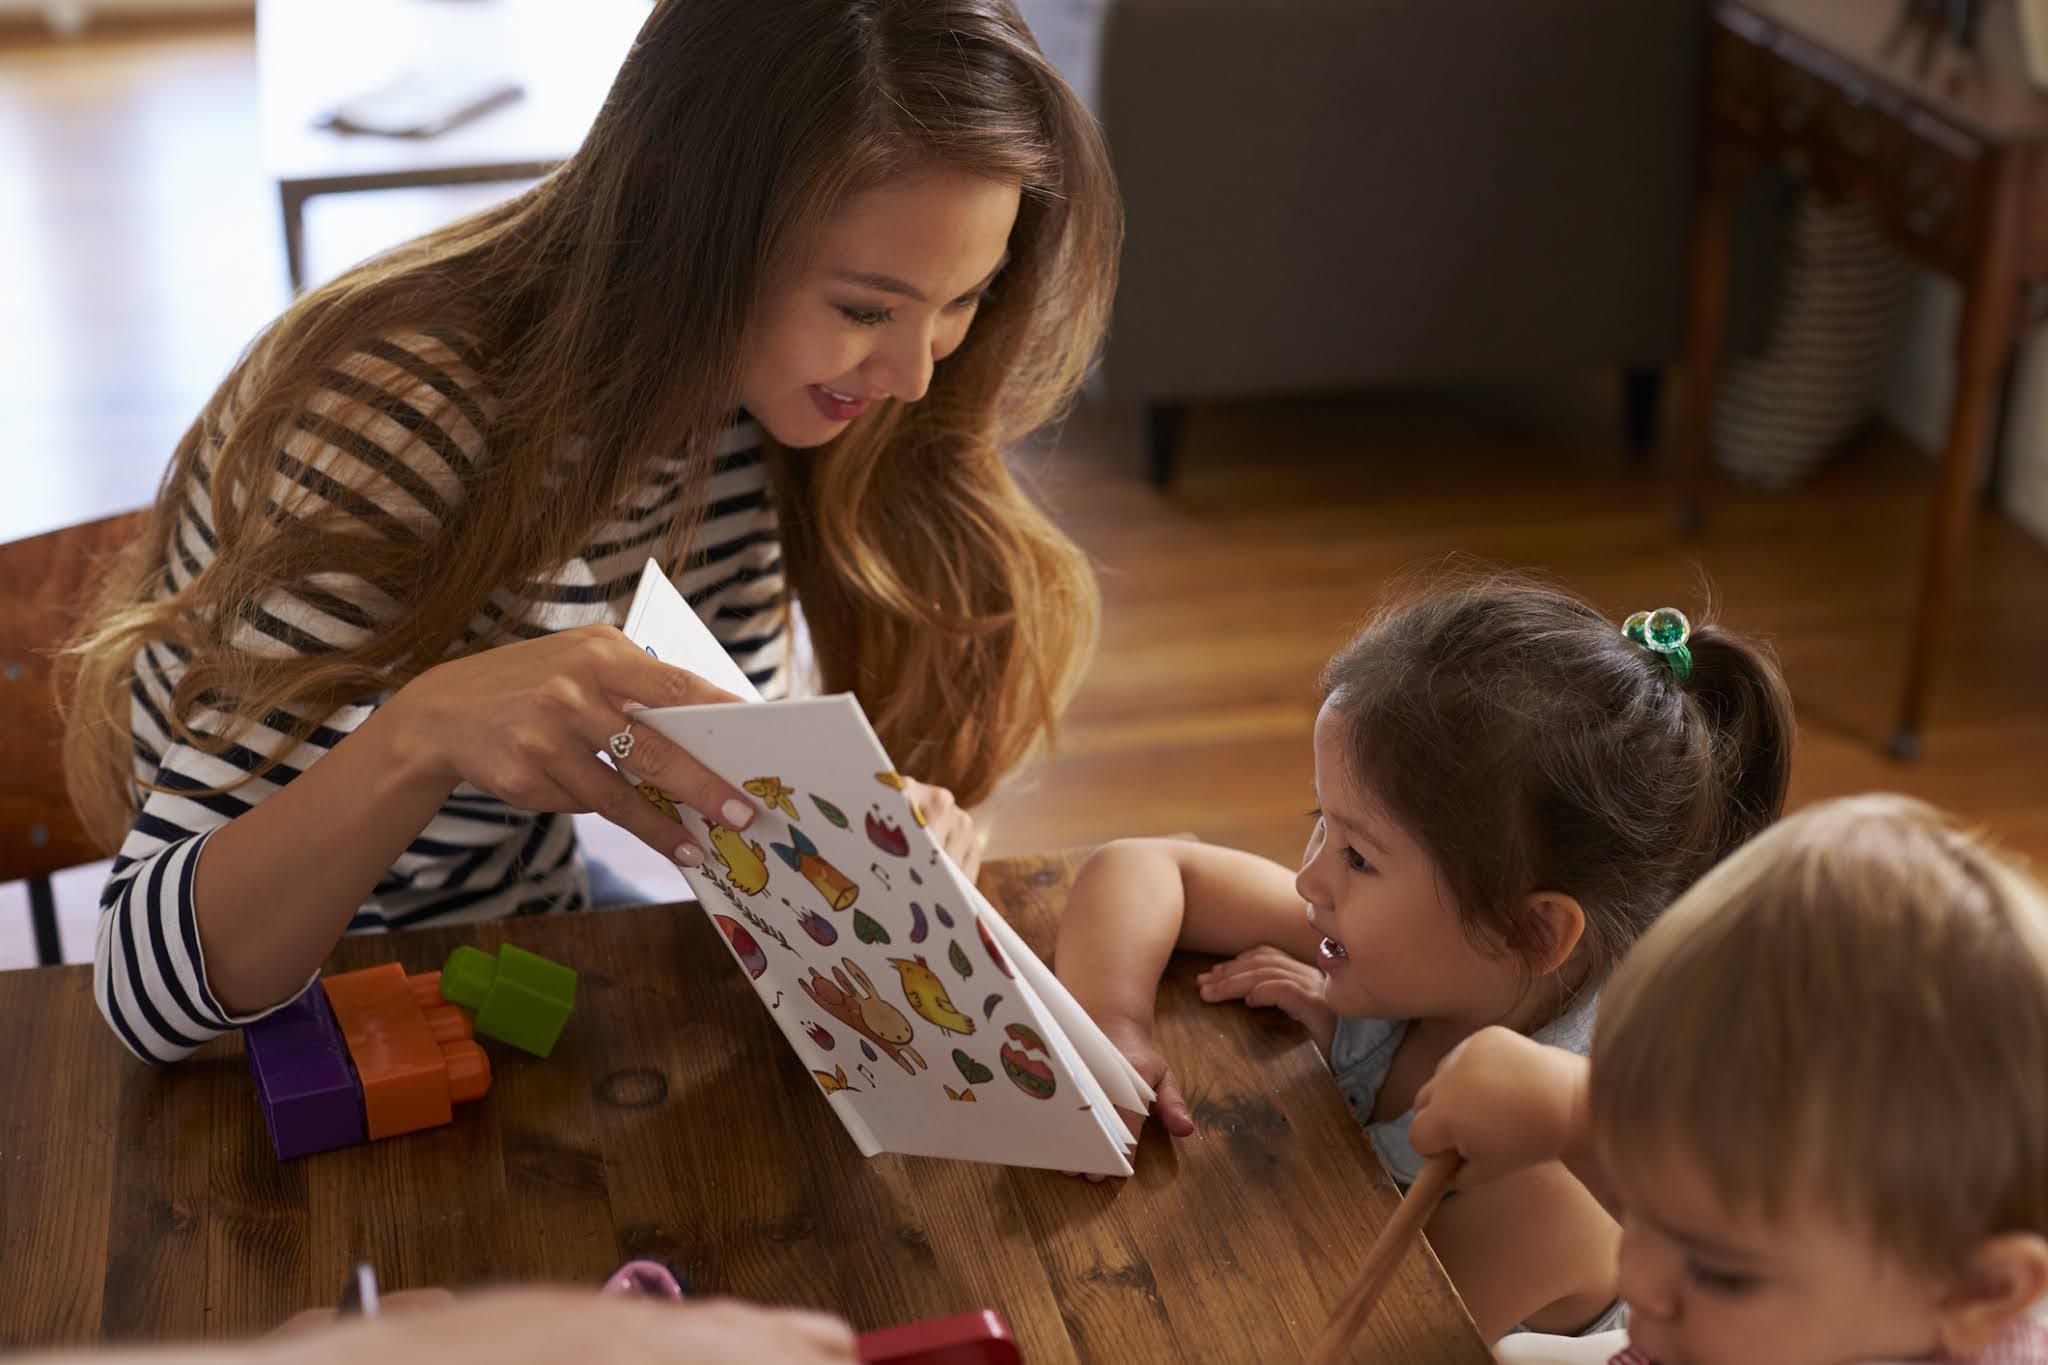 5 Fun Ways to Keep Kids Entertained